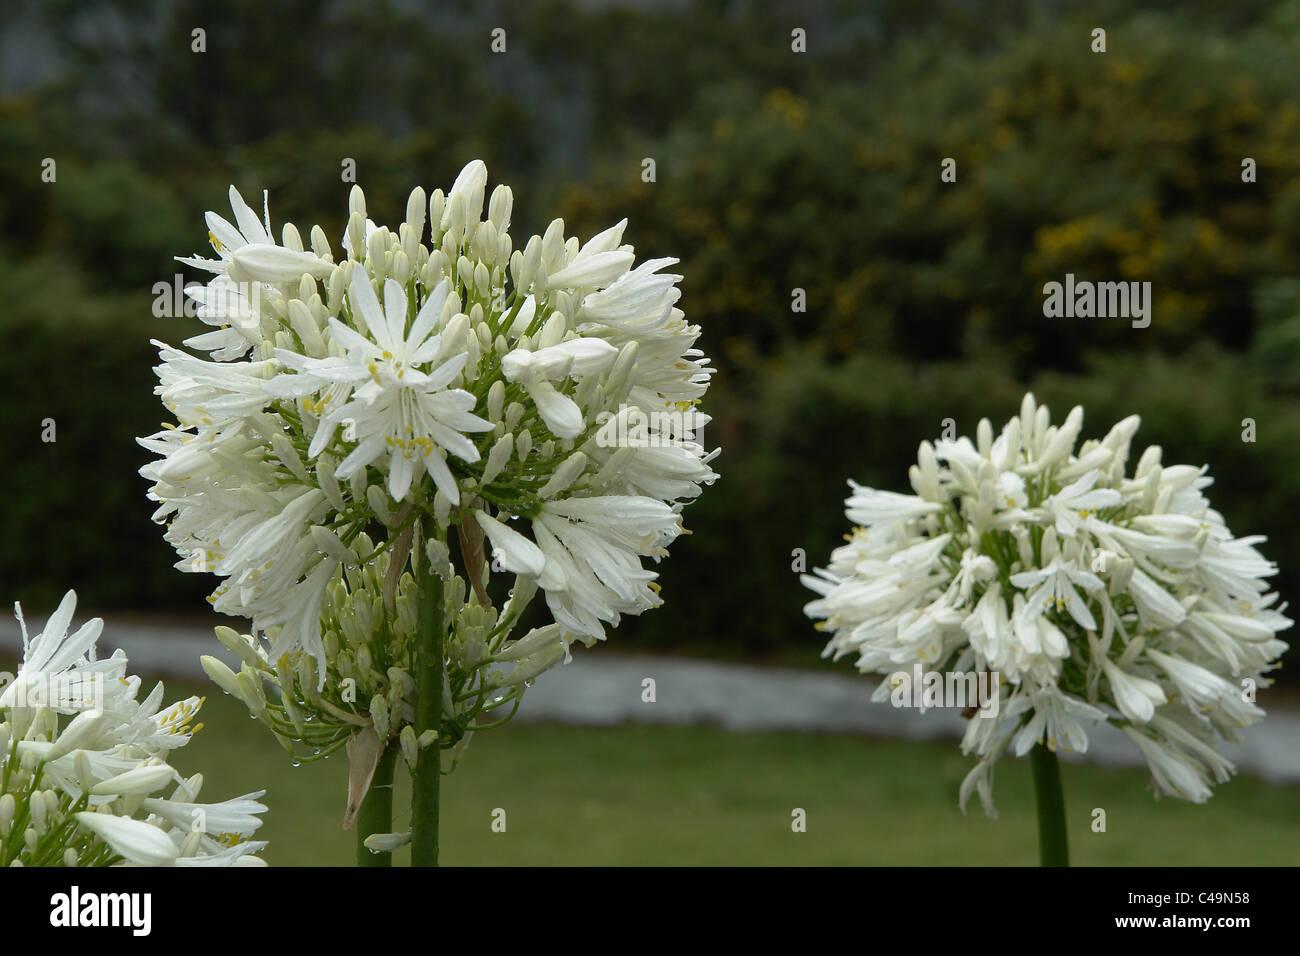 India White Flowers Stock Photos India White Flowers Stock Images